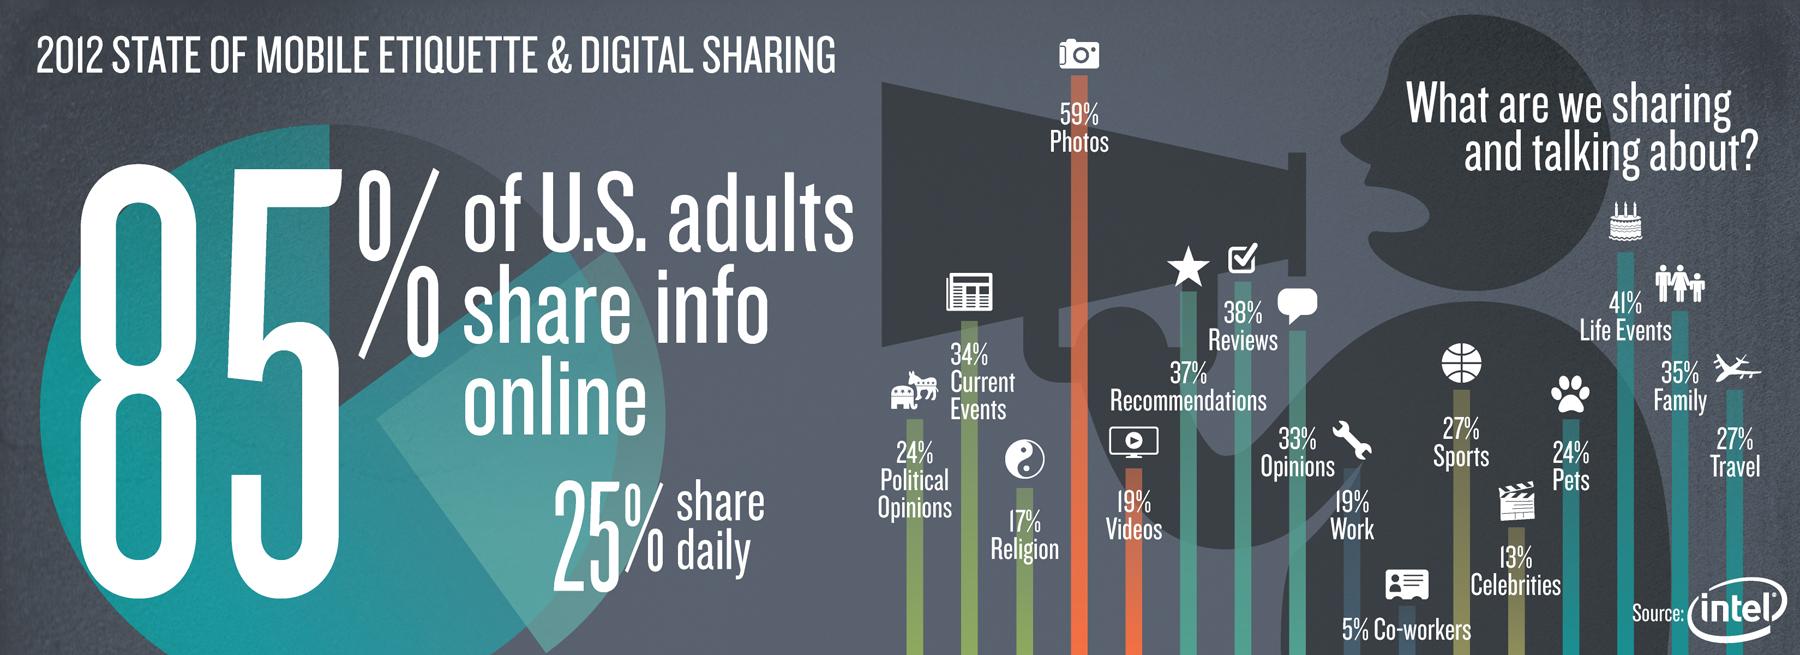 infographic_01_sm.jpg